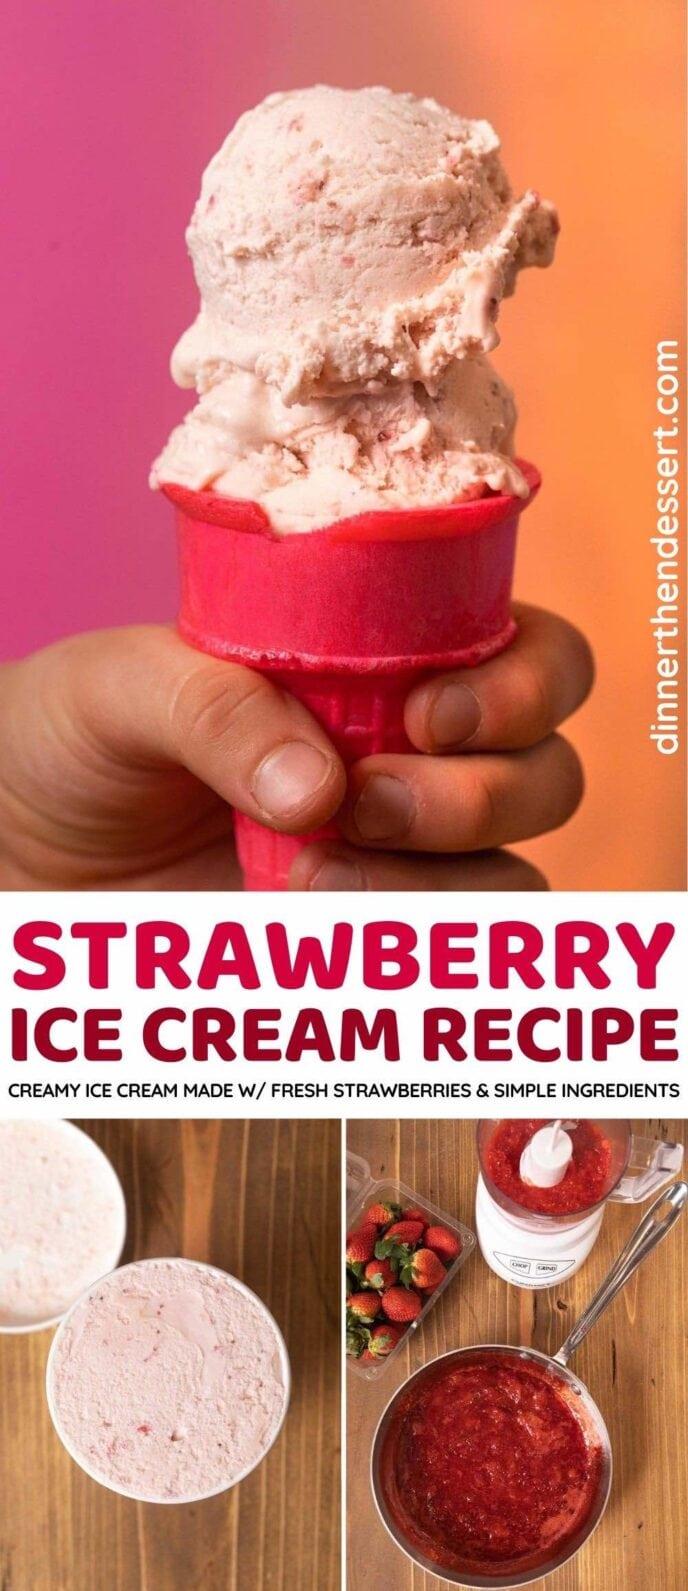 Strawberry Ice Cream photo collage